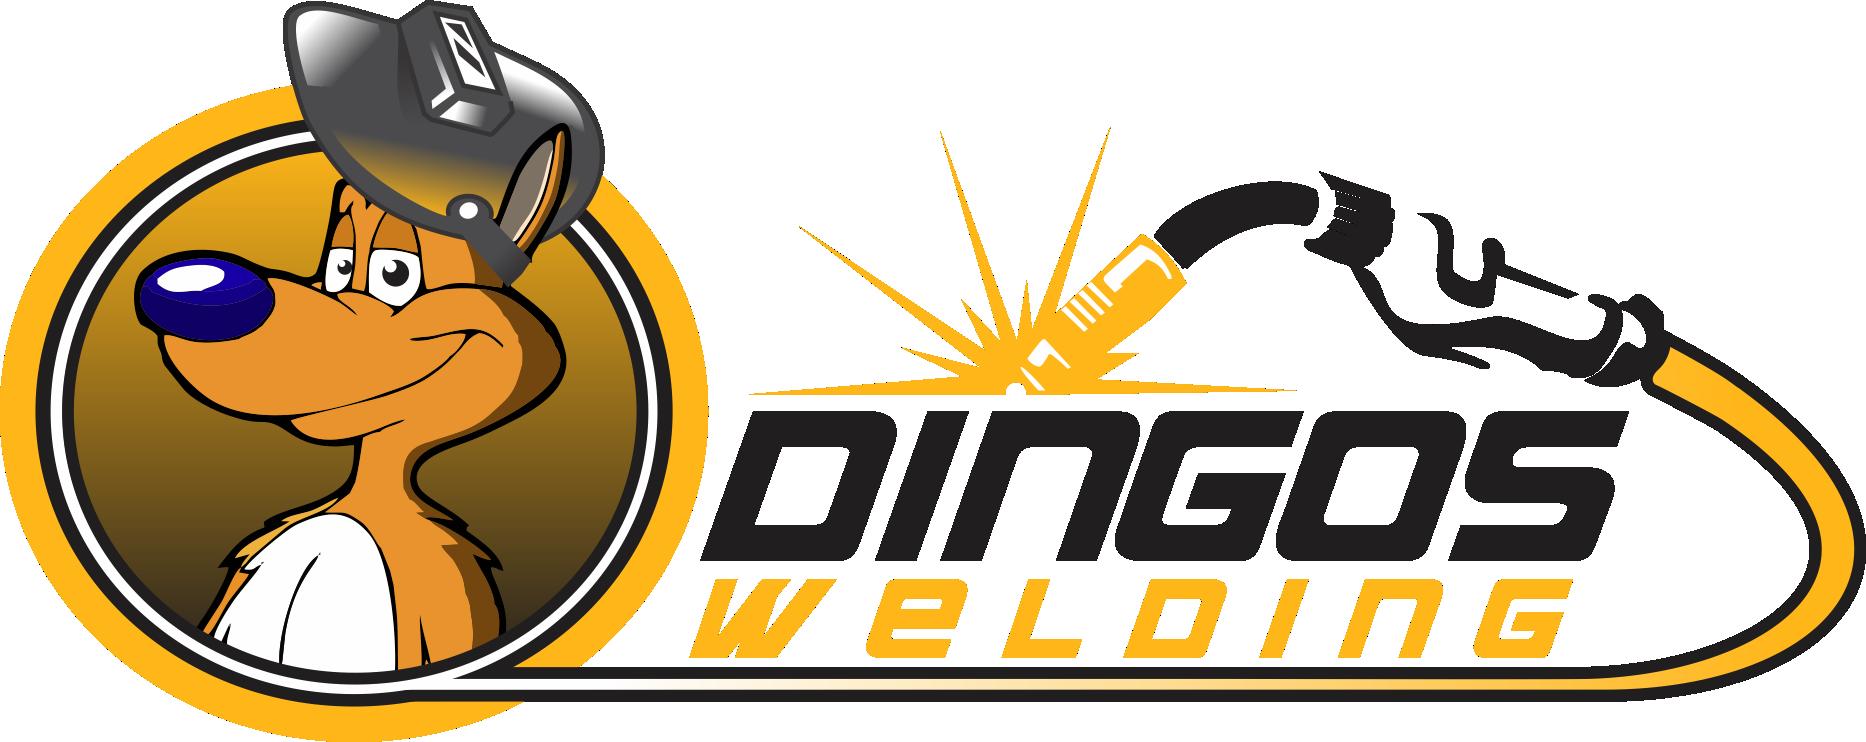 Dingos mobile gold coast. Welding clipart pipe welding